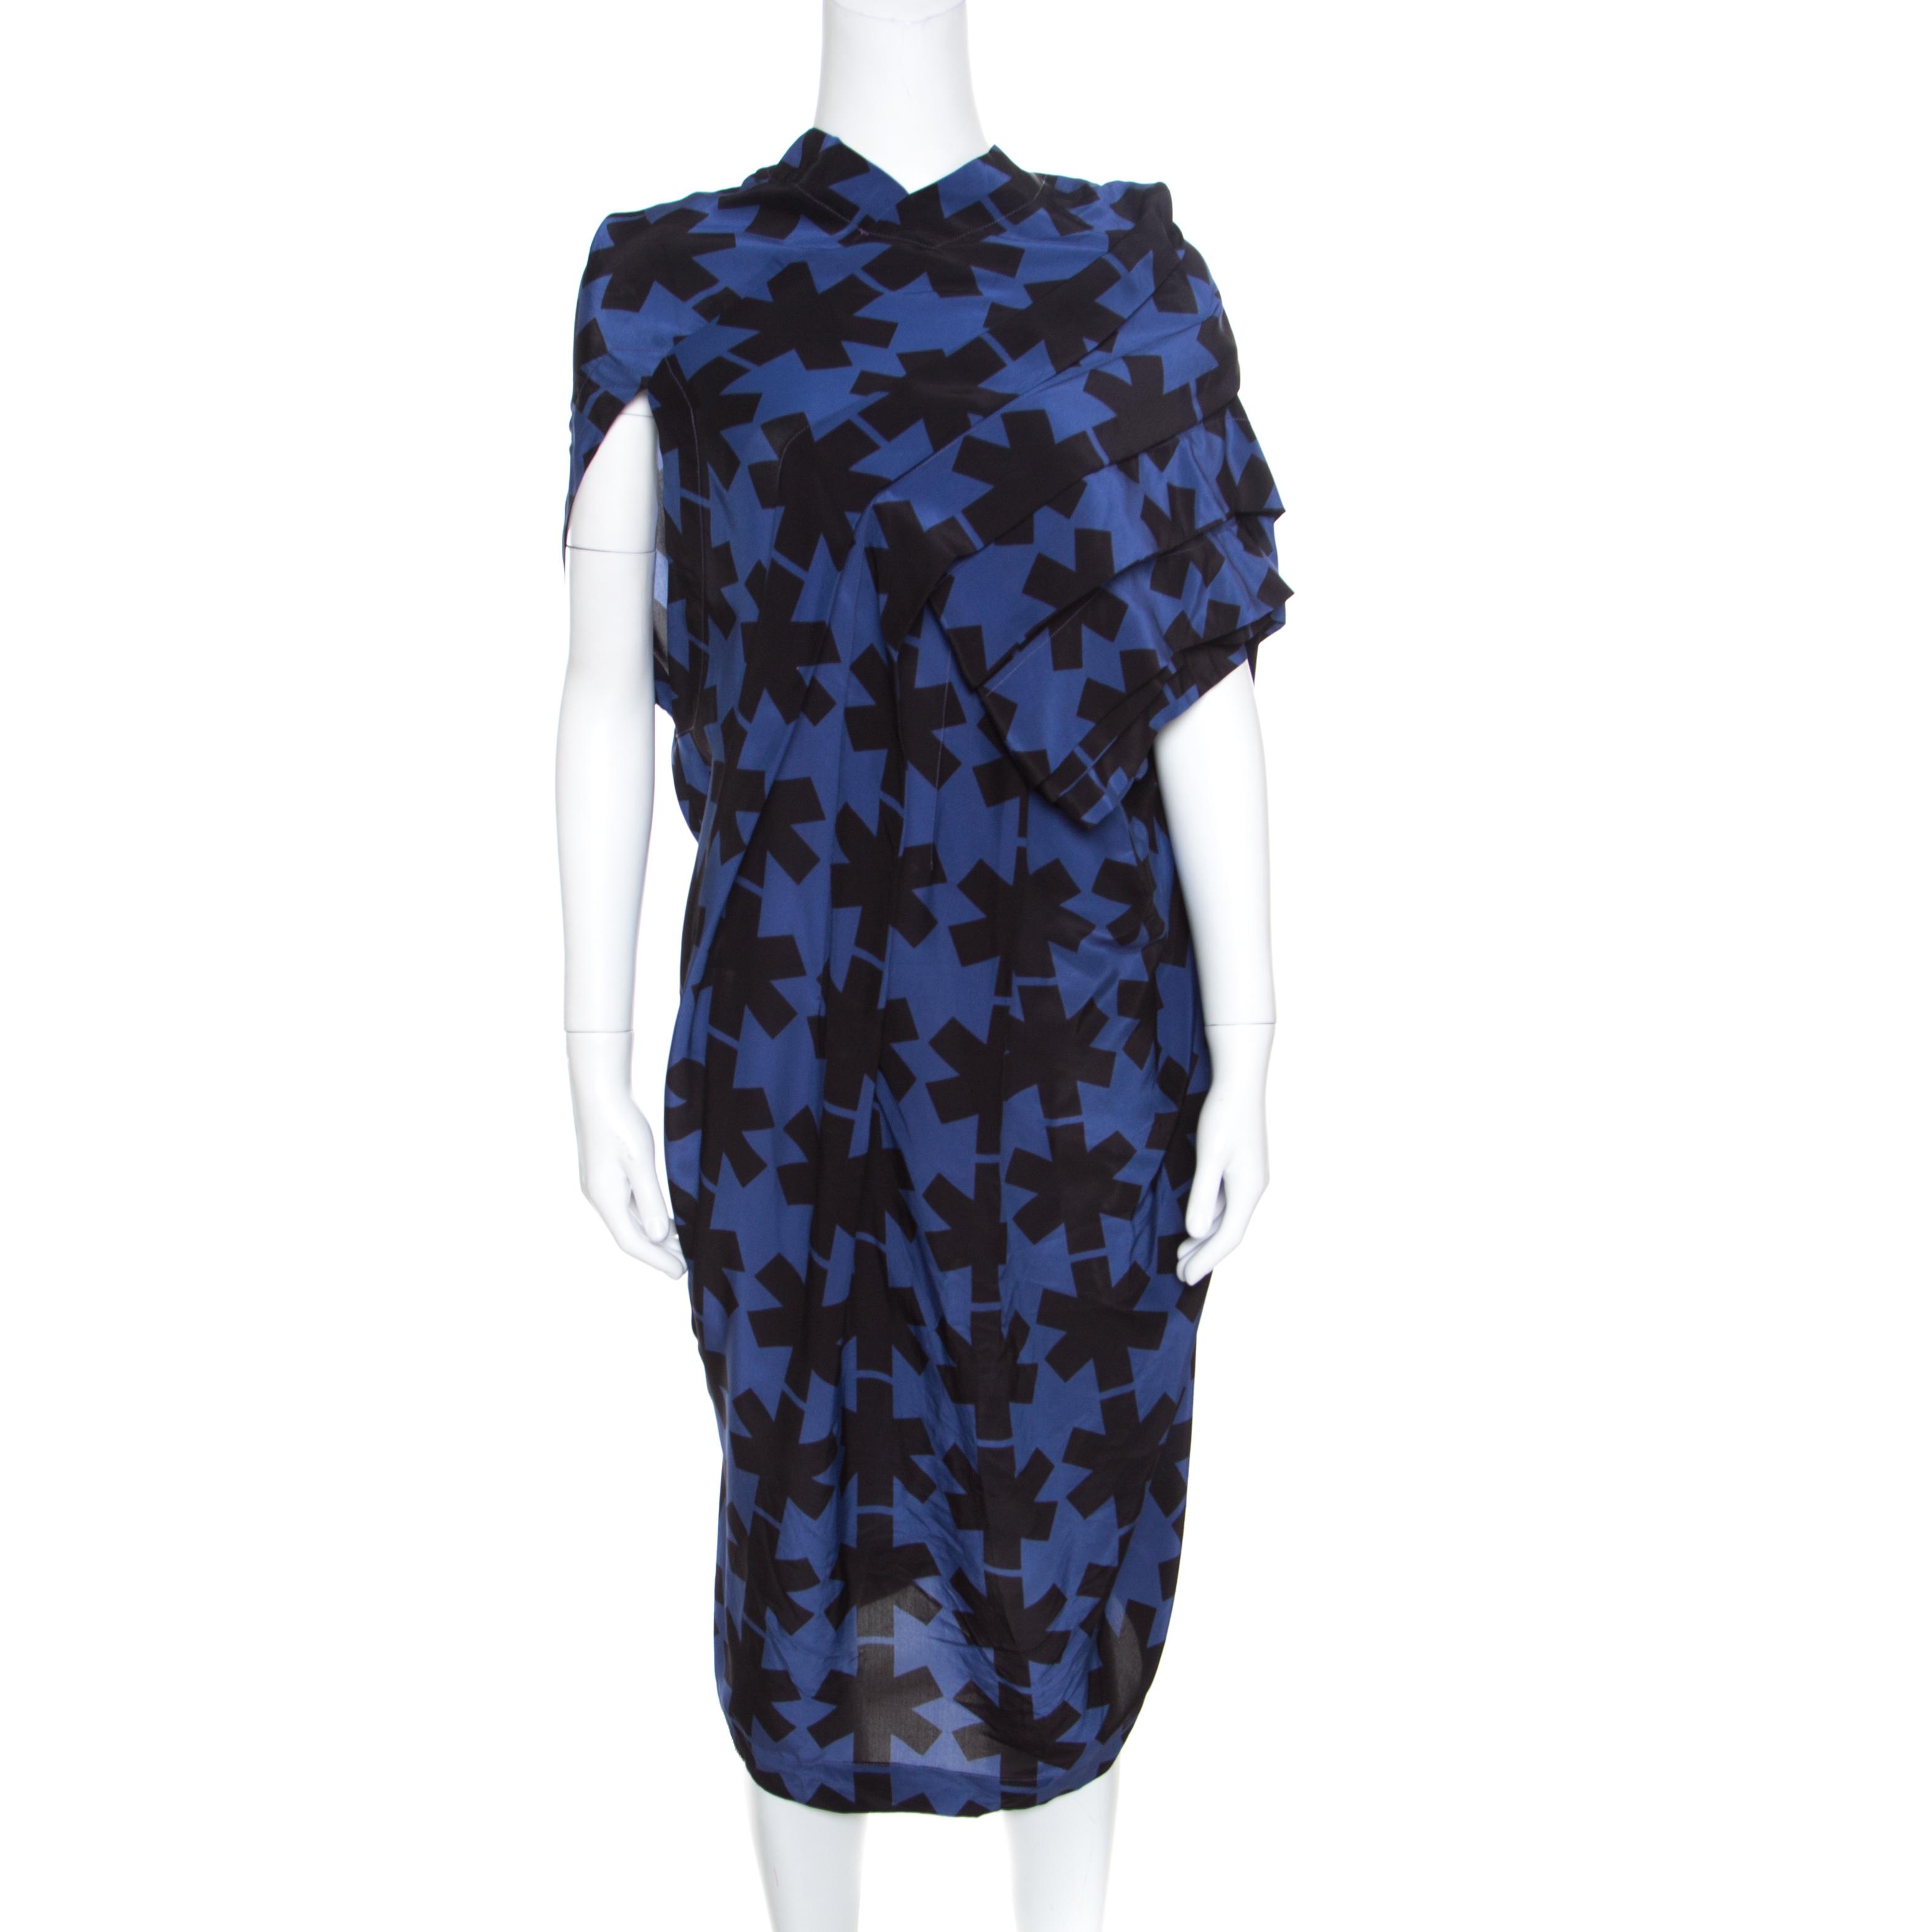 e6c37de3bb6 ... Vivienne Westwood Anglomania Blue and Black Printed Draped Asymmetric  Dress M. nextprev. prevnext